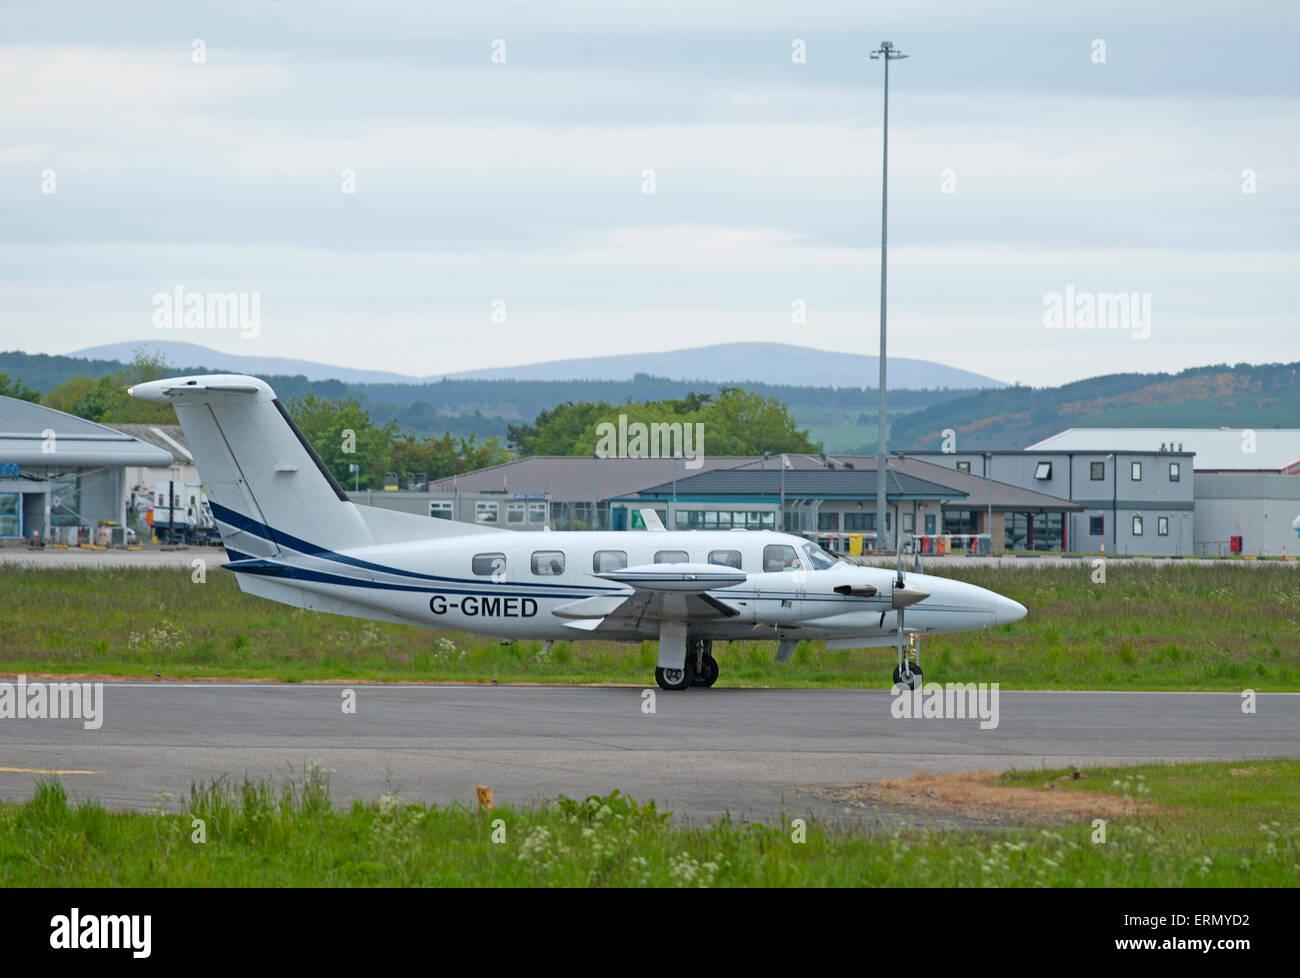 Piper PA-42-720 Cheyenne IIIA. SCO 9848. - Stock Image